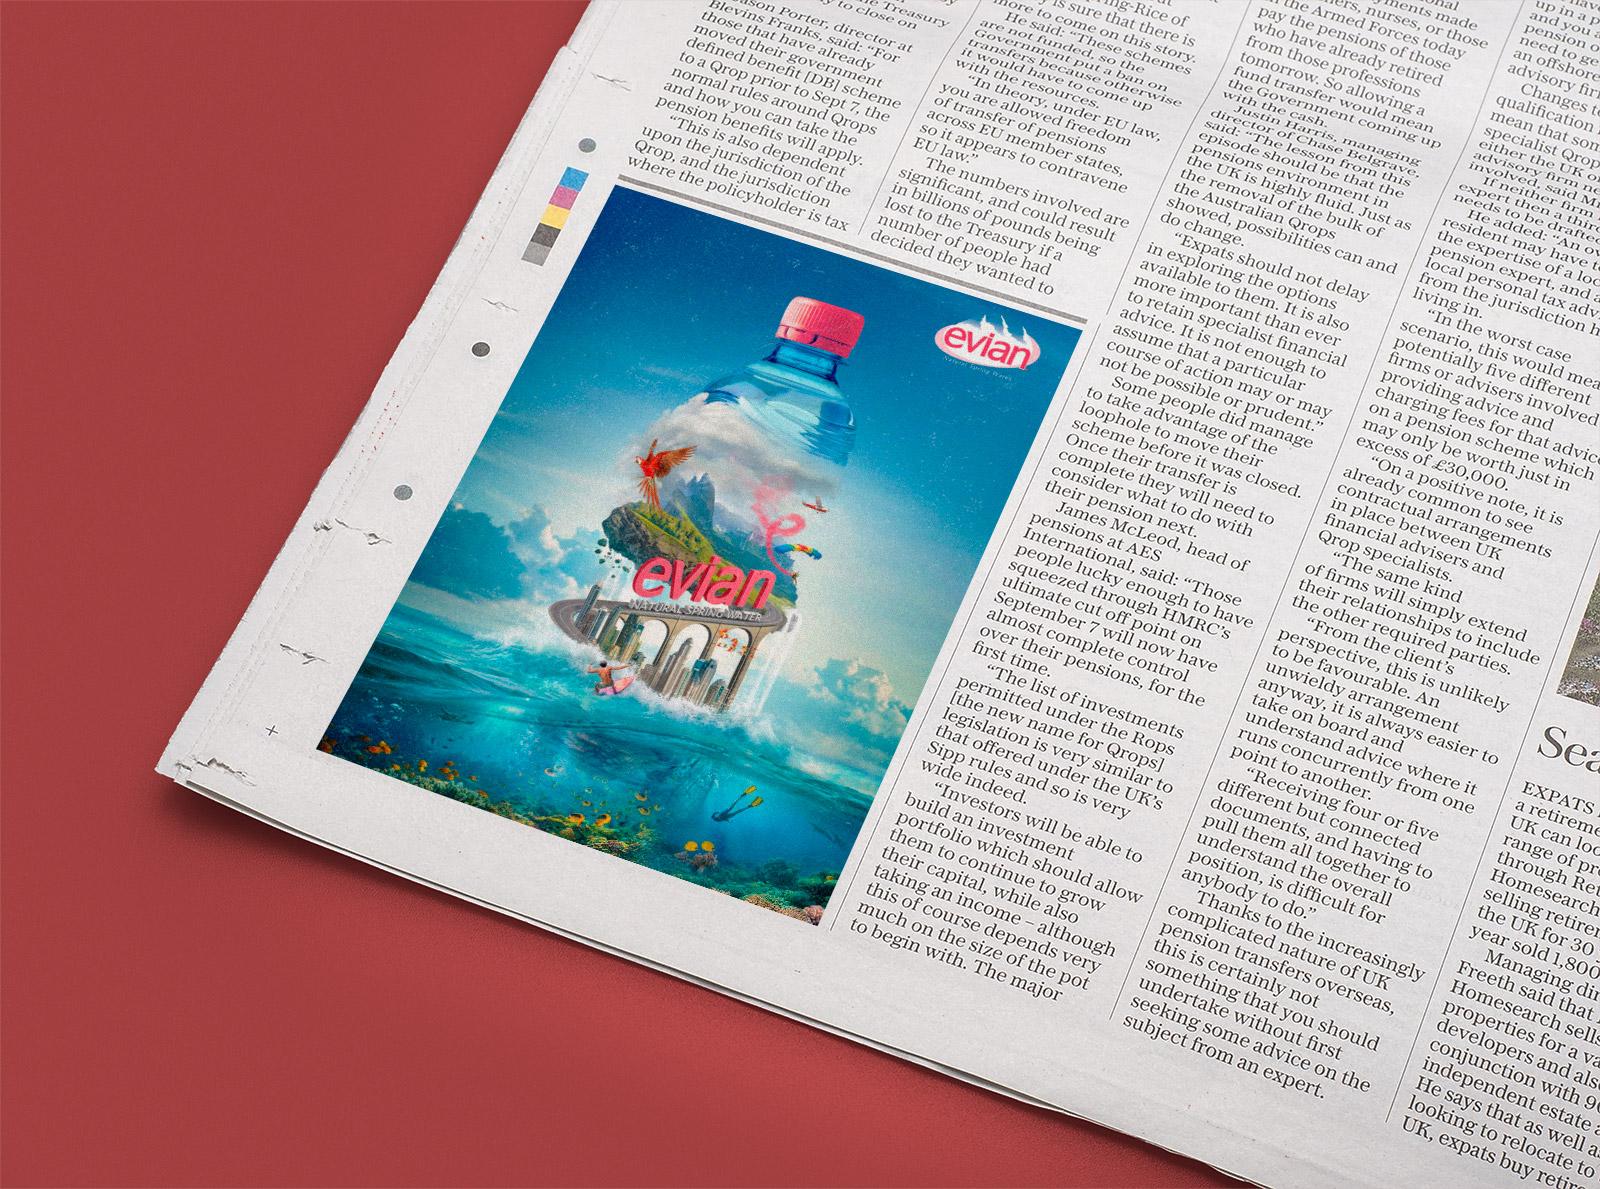 Free-Vertical-Newspaper-Adverts-Mockup-PSD-3